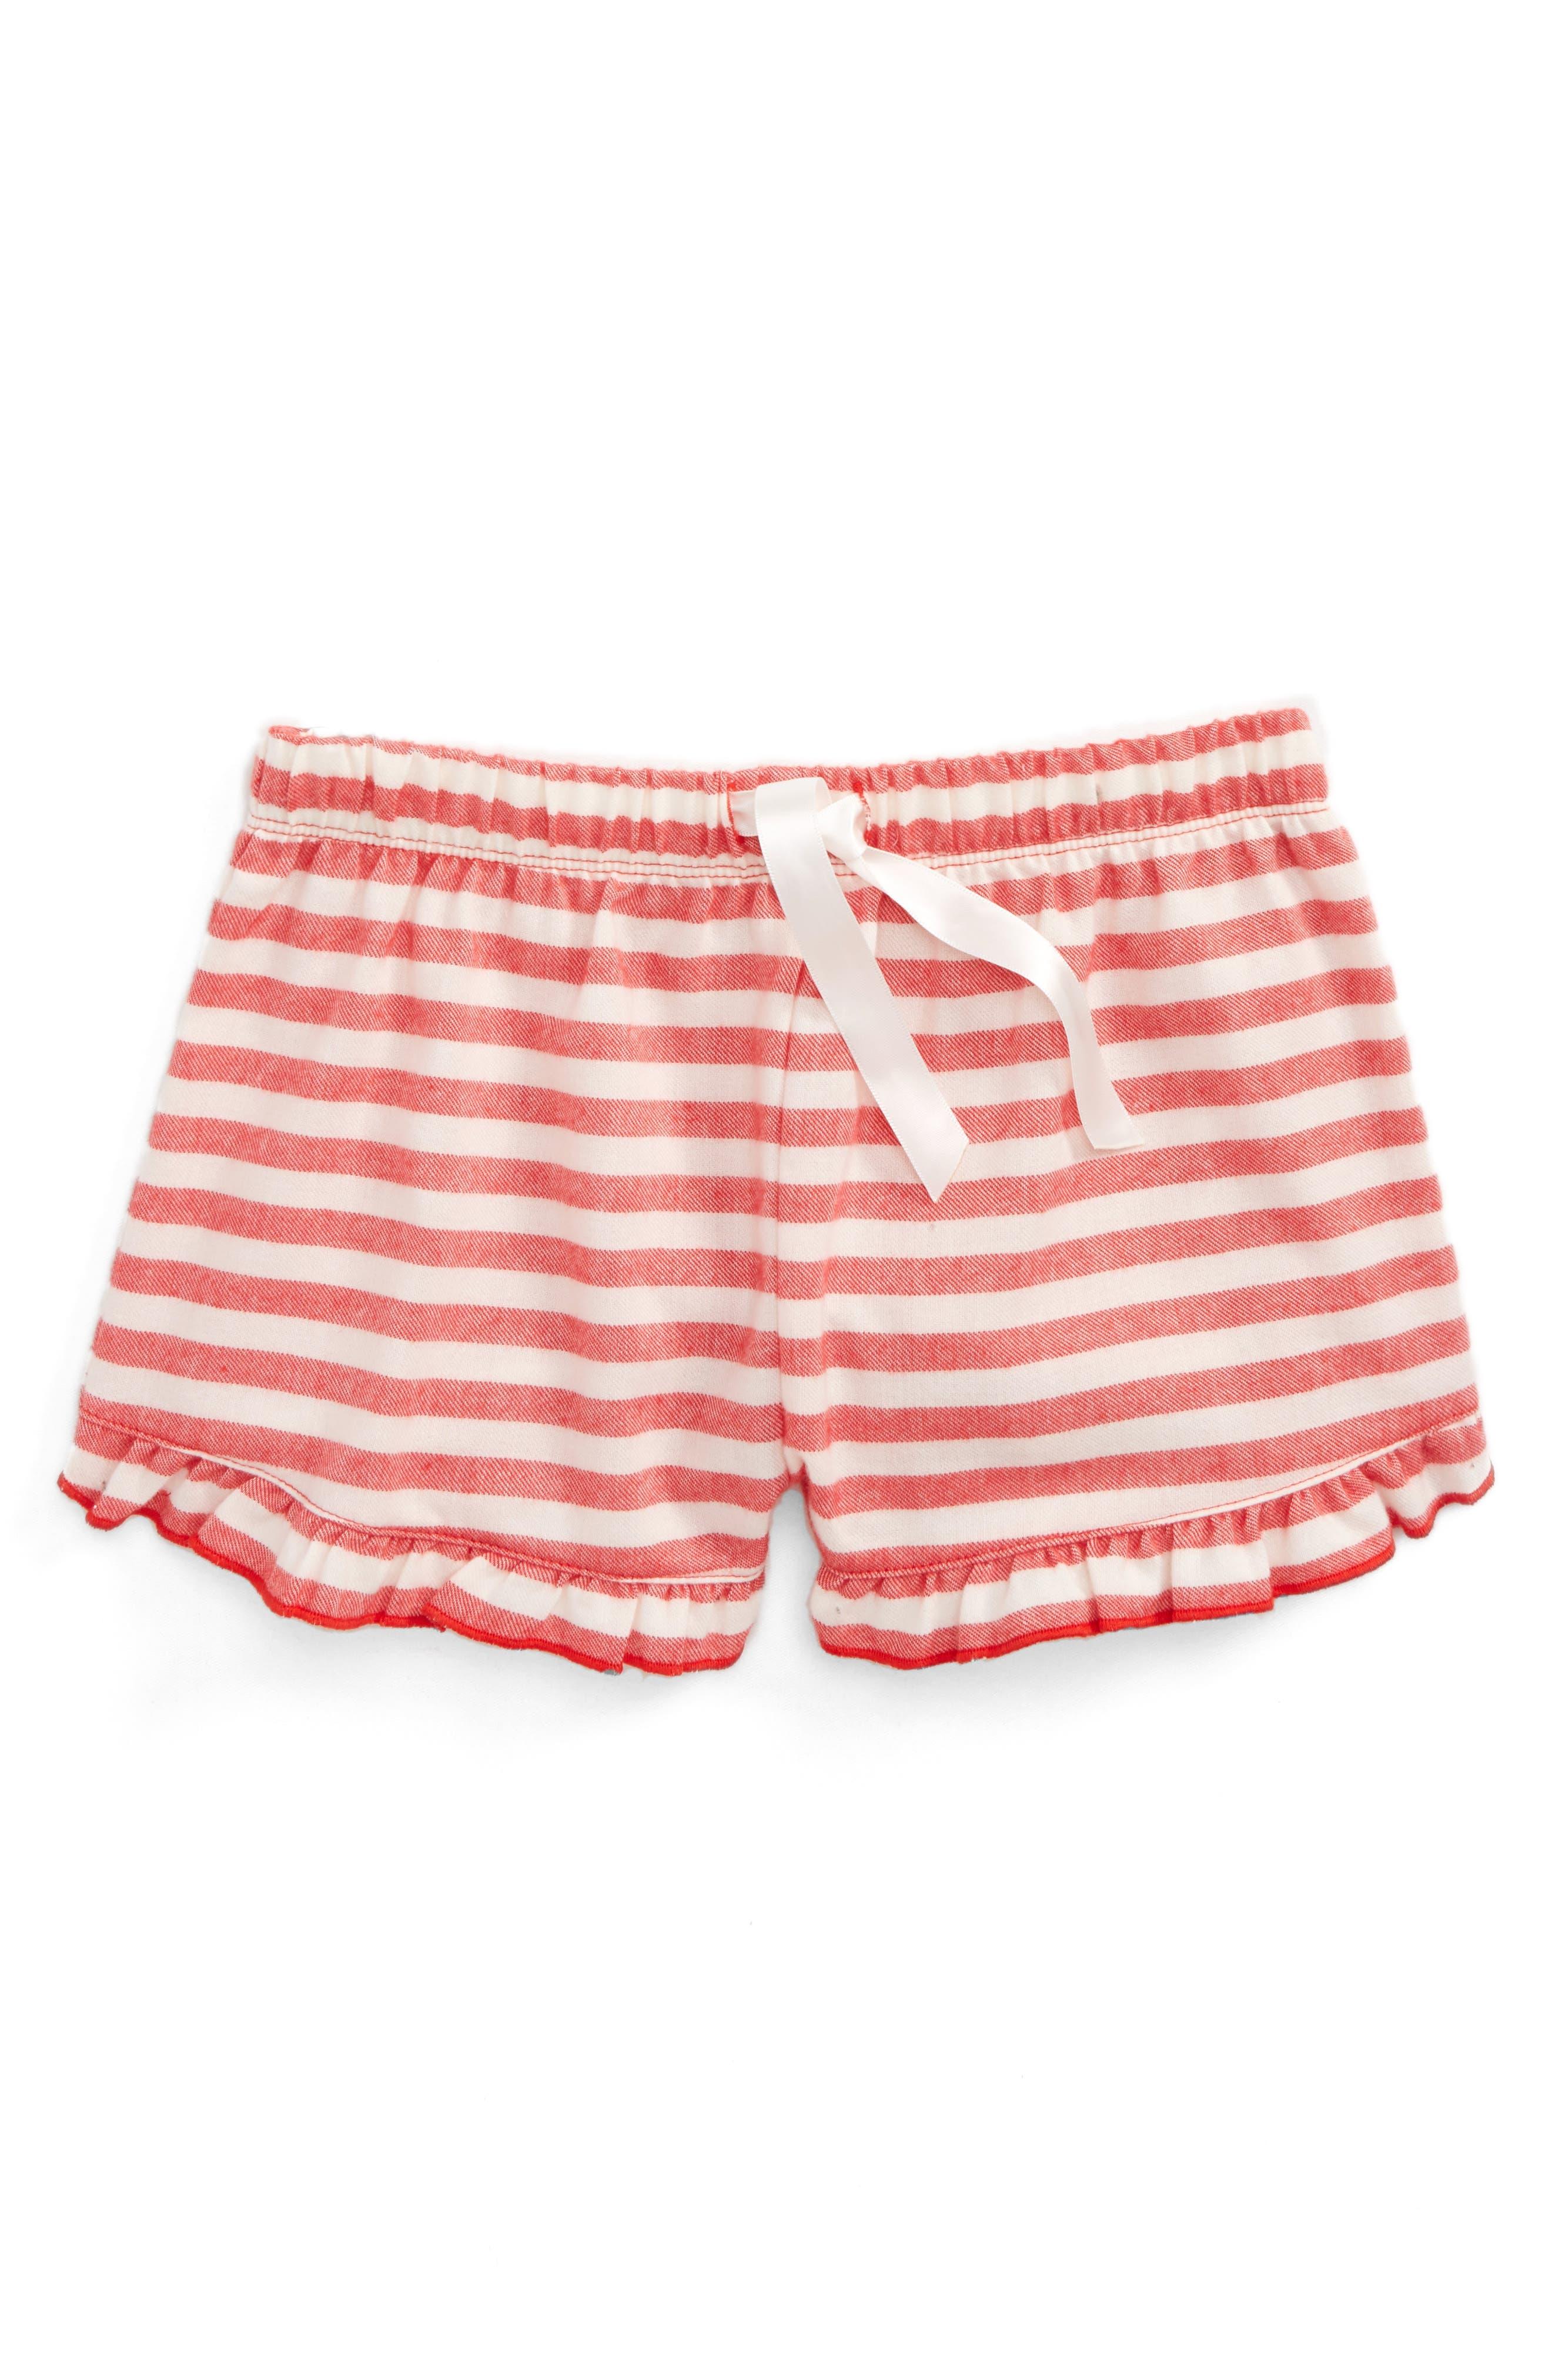 Flannel Shorts,                             Main thumbnail 8, color,